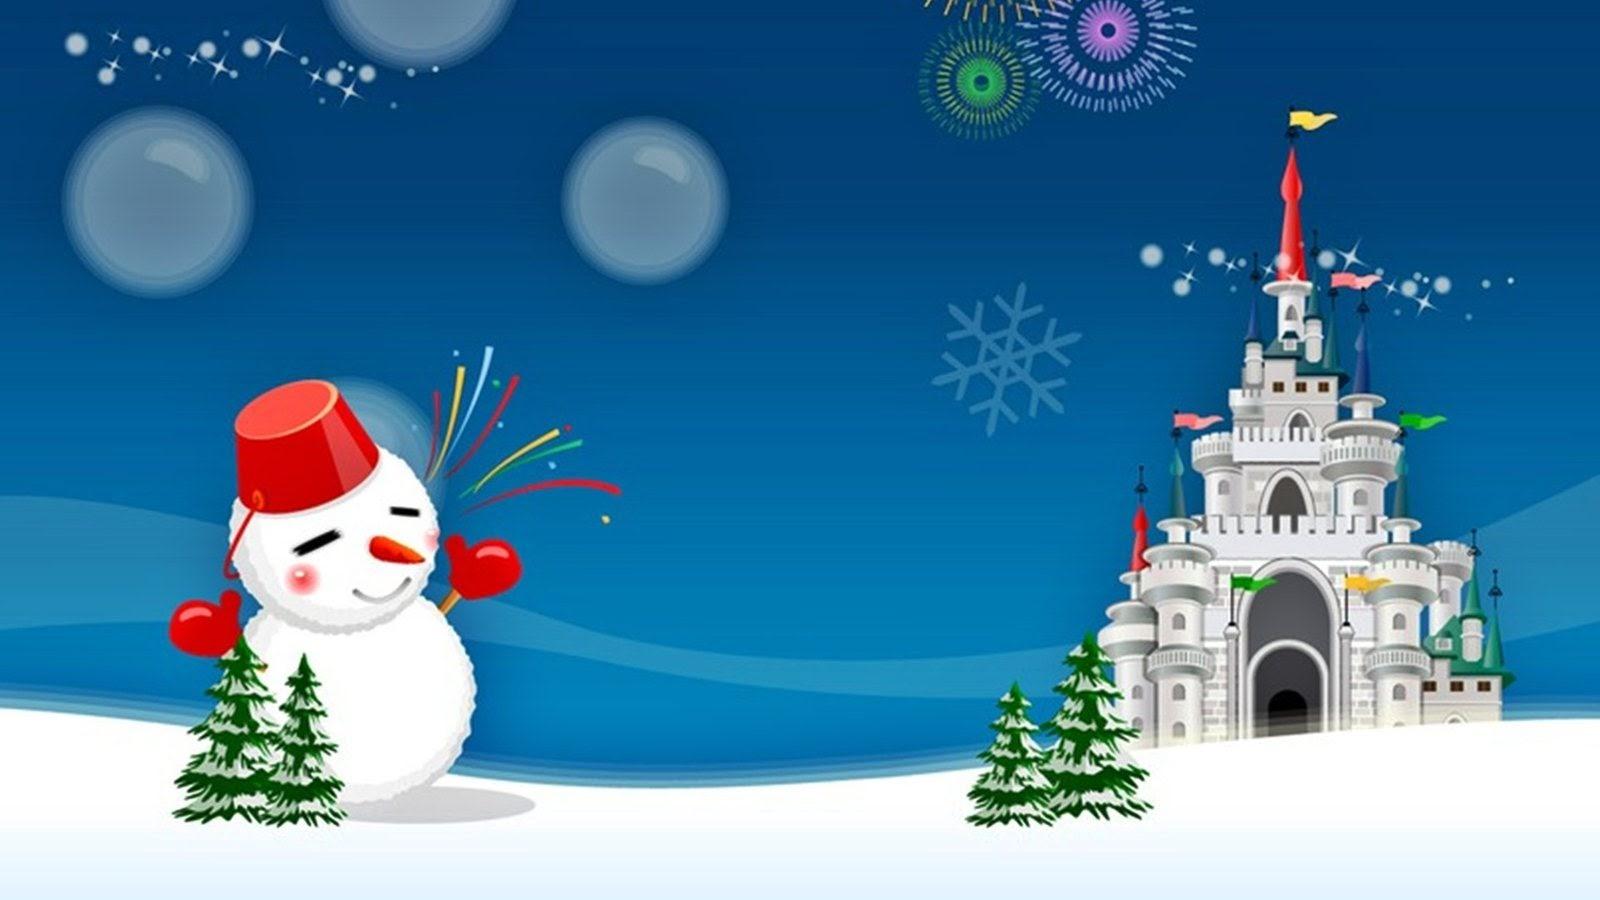 Kumpulan Gambar Wallpaper HD Natal Tahun Baru 2019 Untuk Desktop